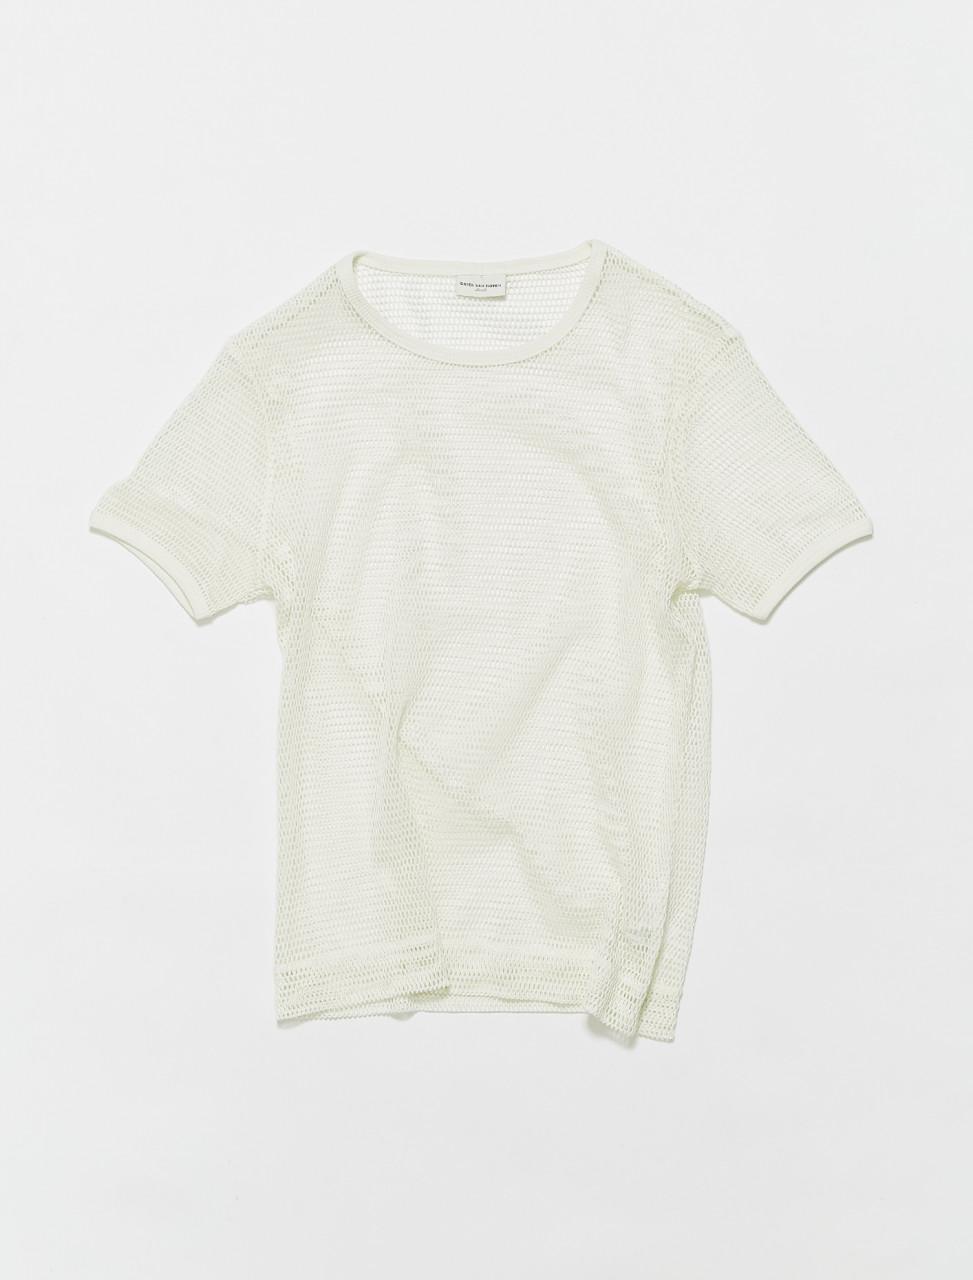 211-21115-2616-001 DRIES VAN NOTEN HADAL SHEER T SHIRT WHITE